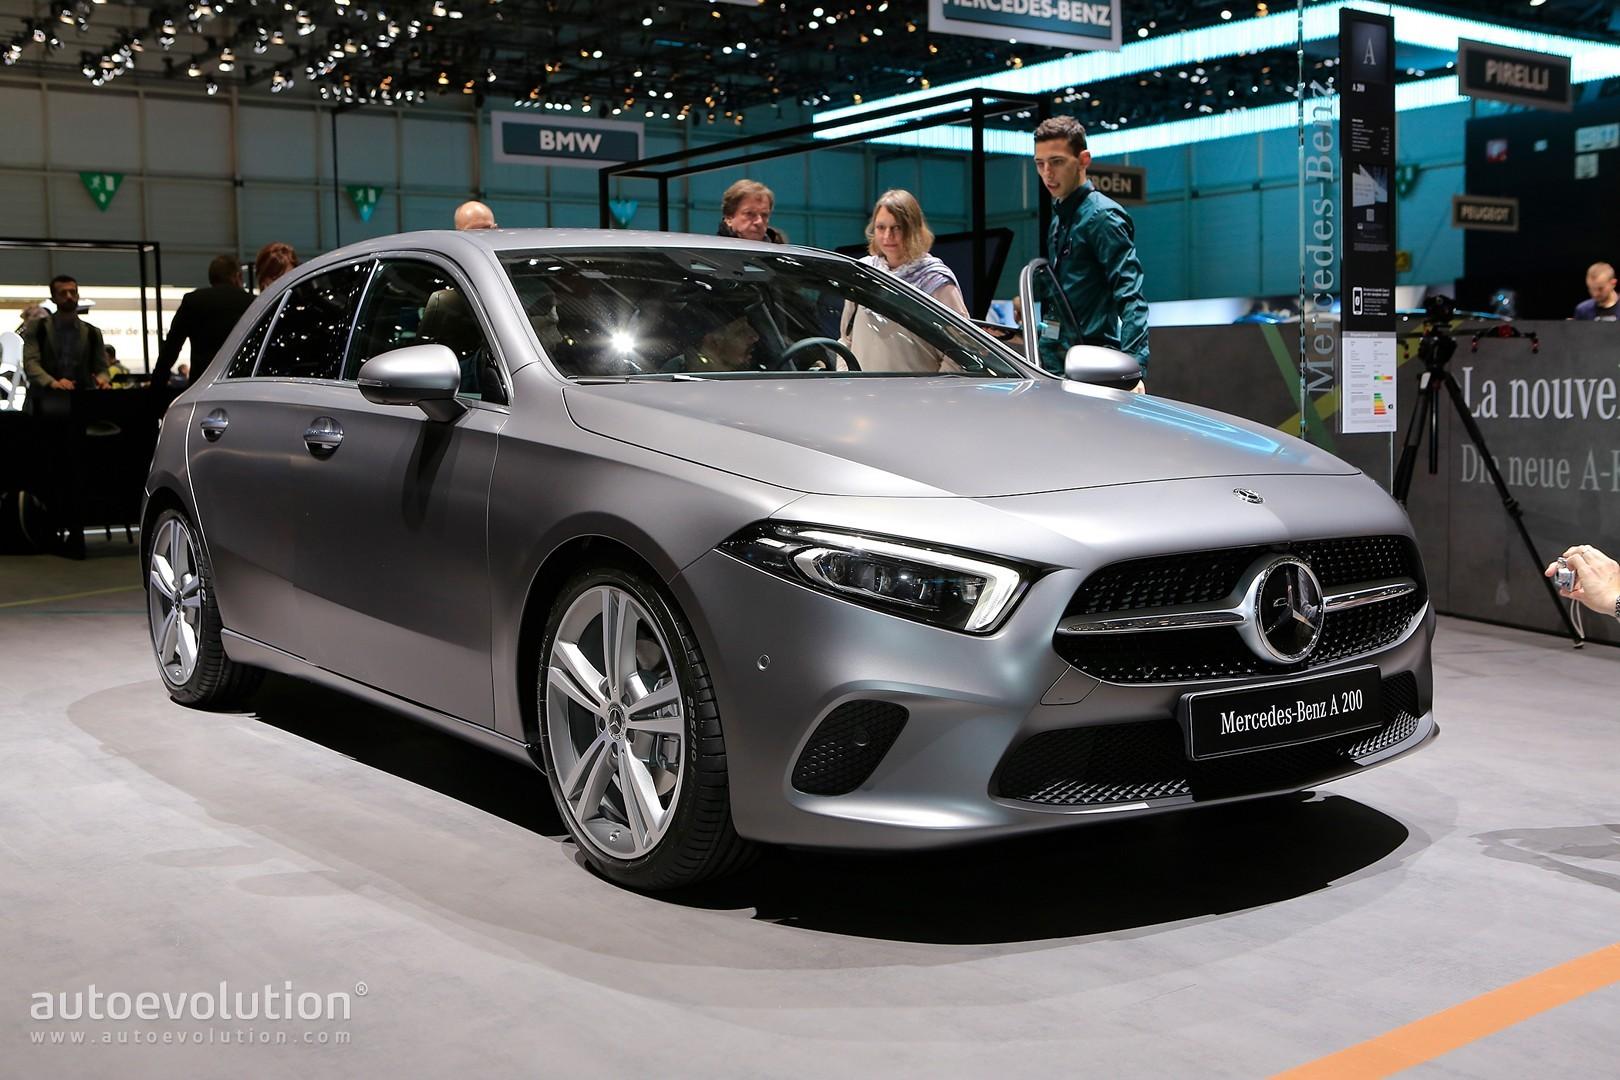 2019 Mercedes-Benz A-Class Redefines The Premium Compact